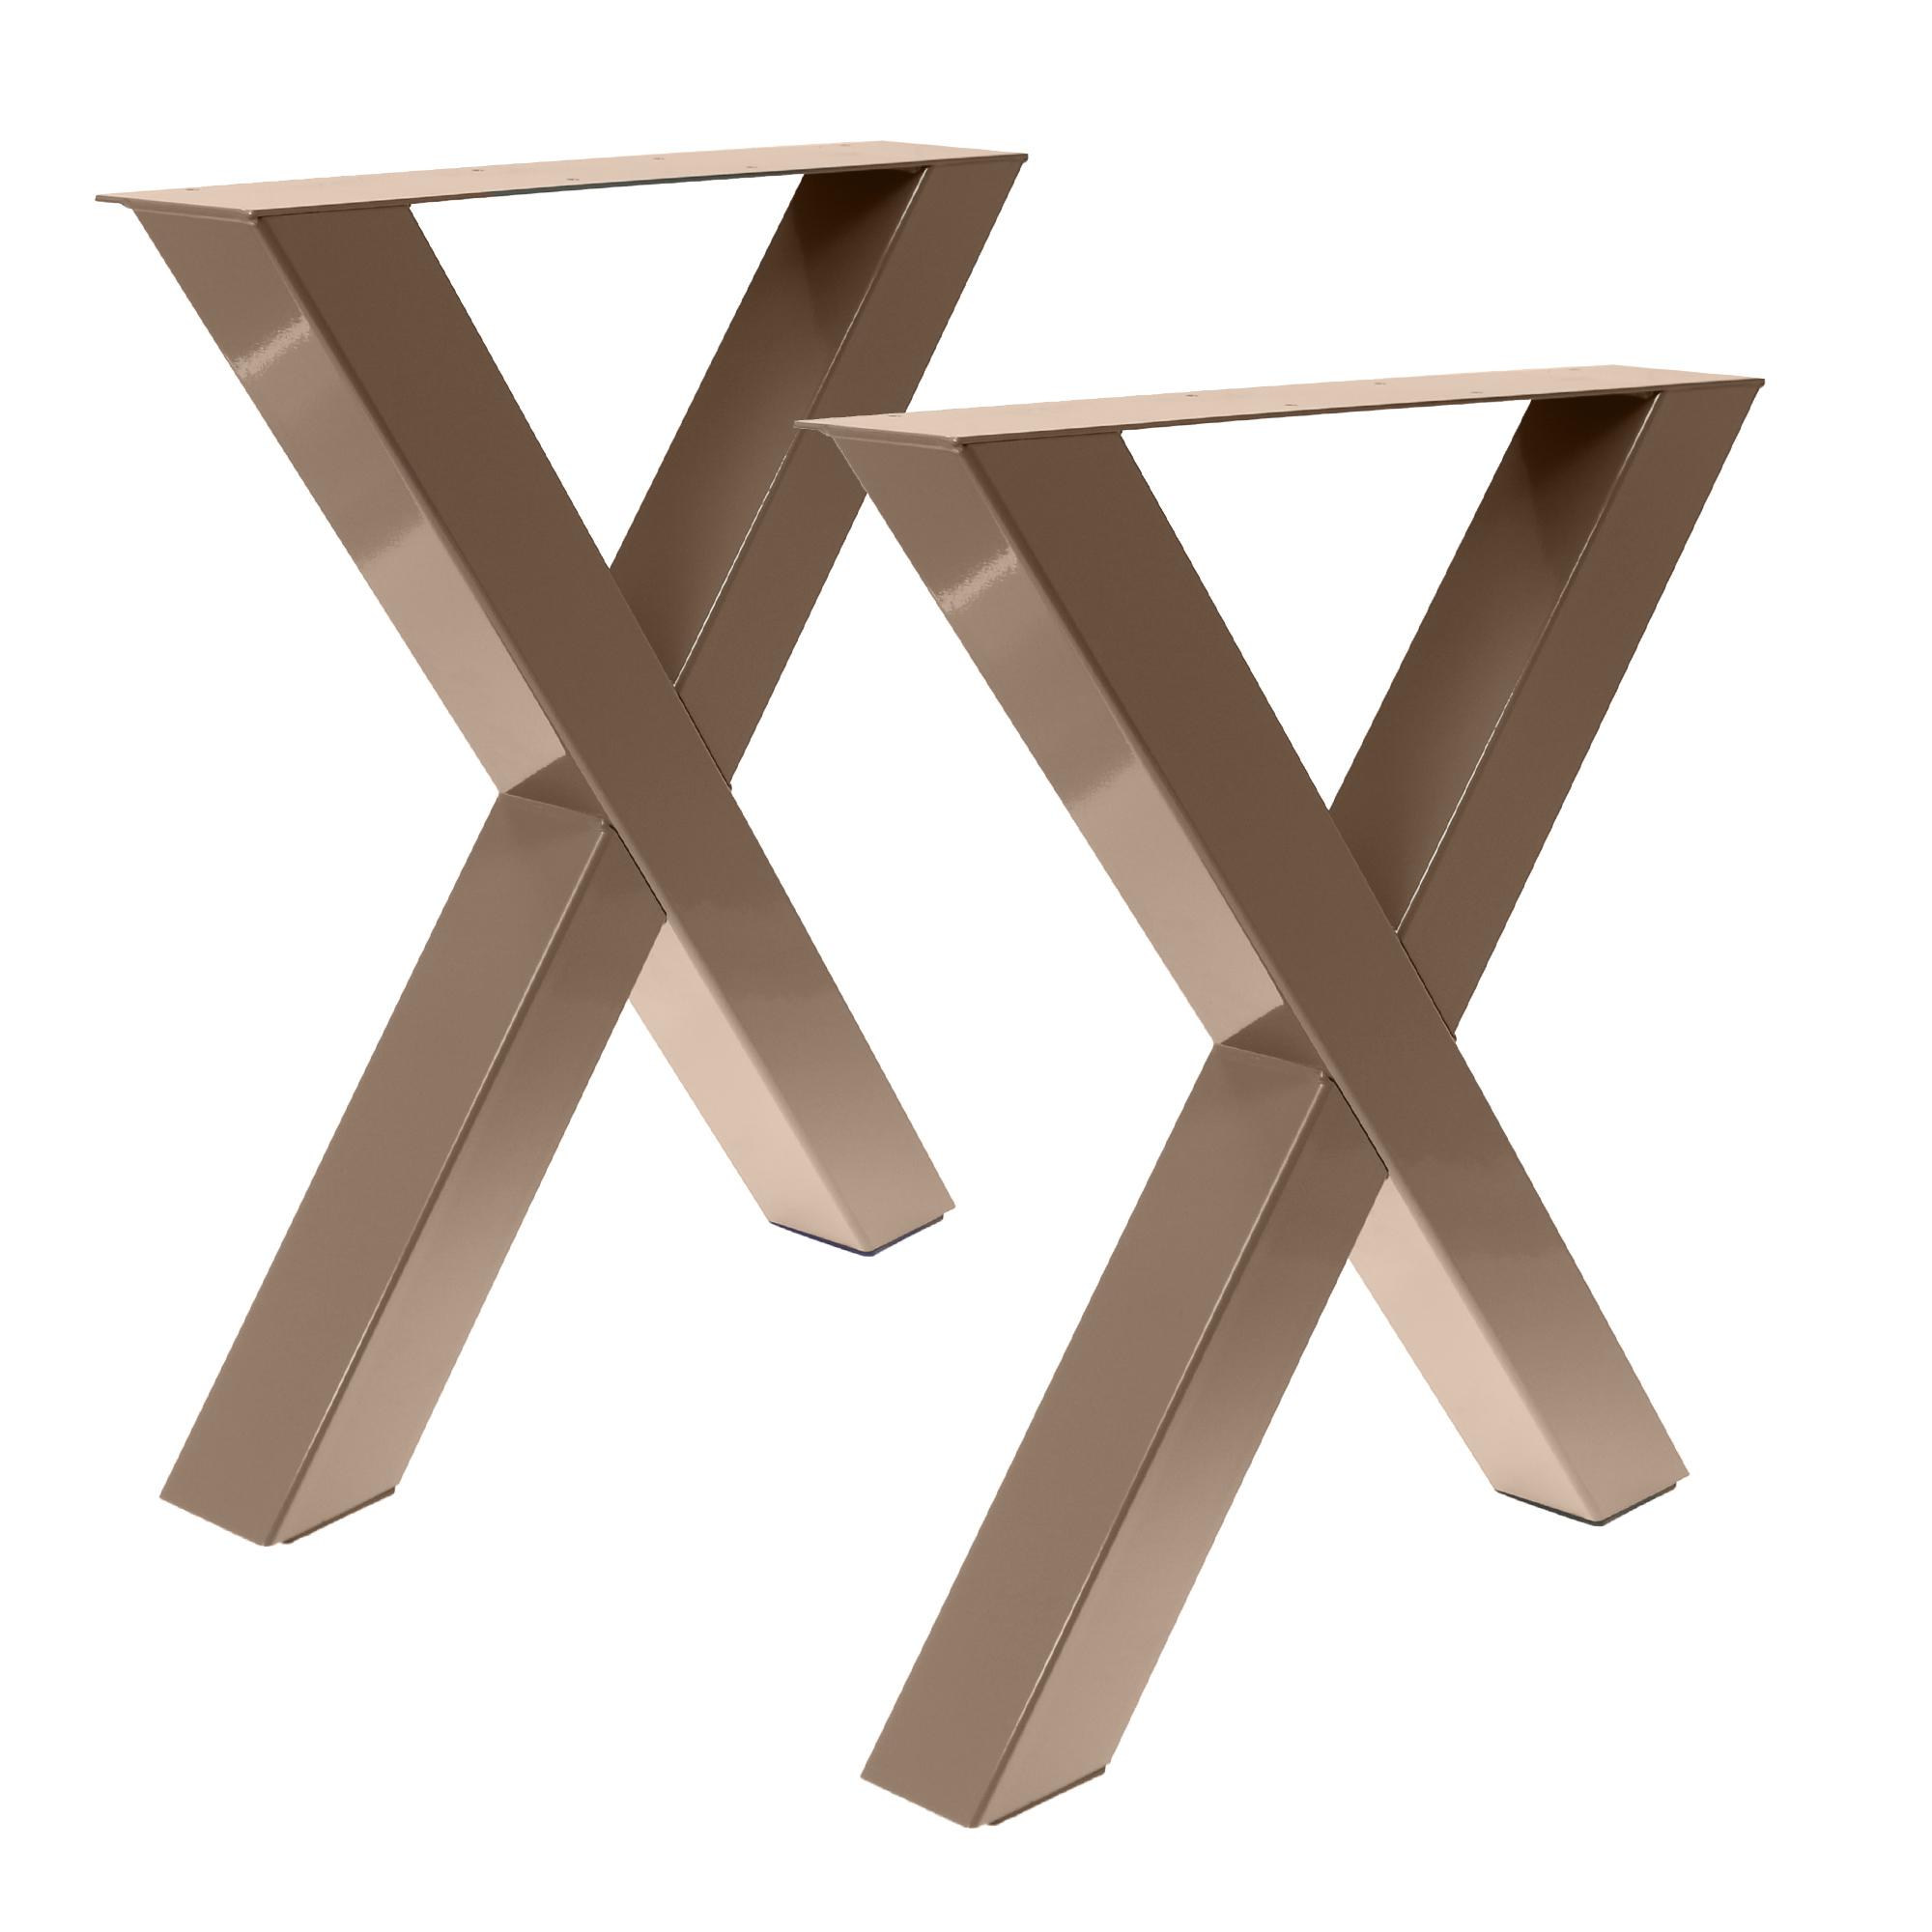 Tisch X - 80/80 Graubeige Optik 2er Set